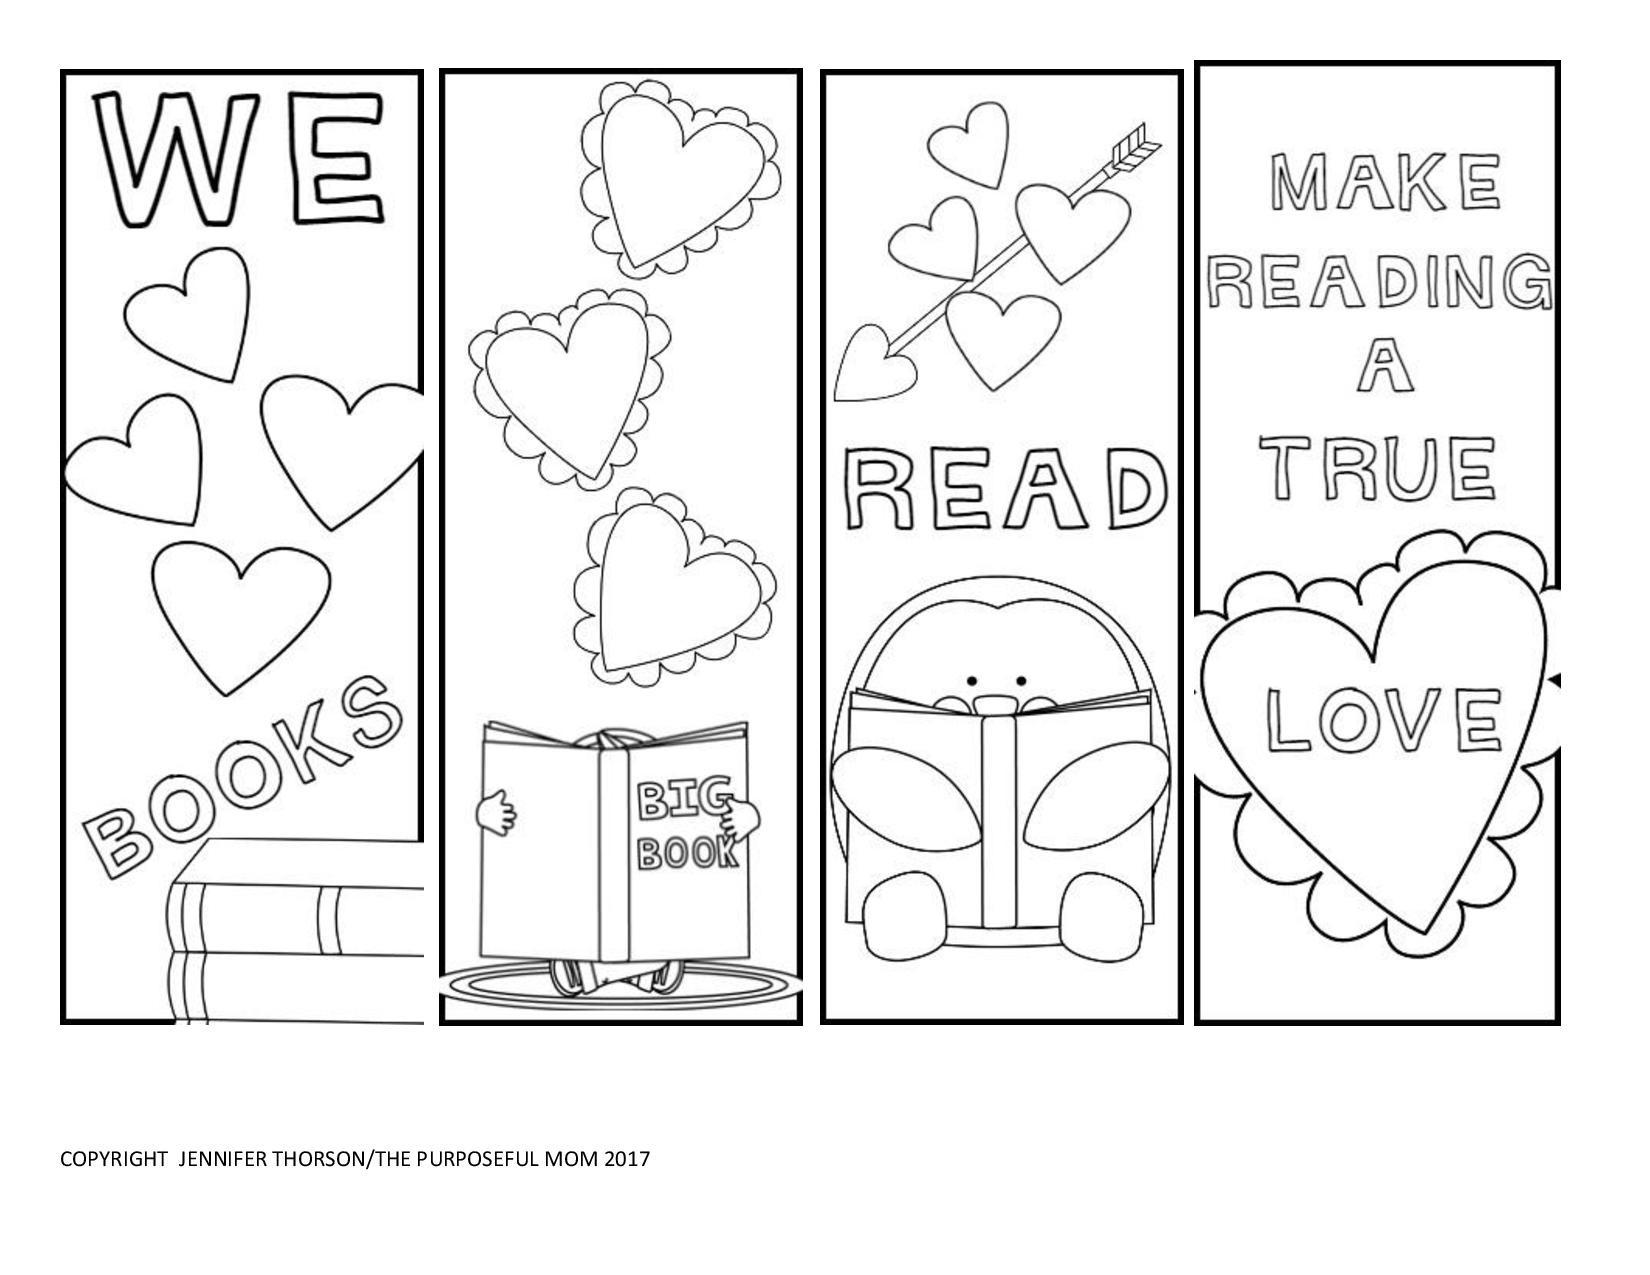 Usborne Books Archives - The Purposeful Mom - Free Printable Valentine Books